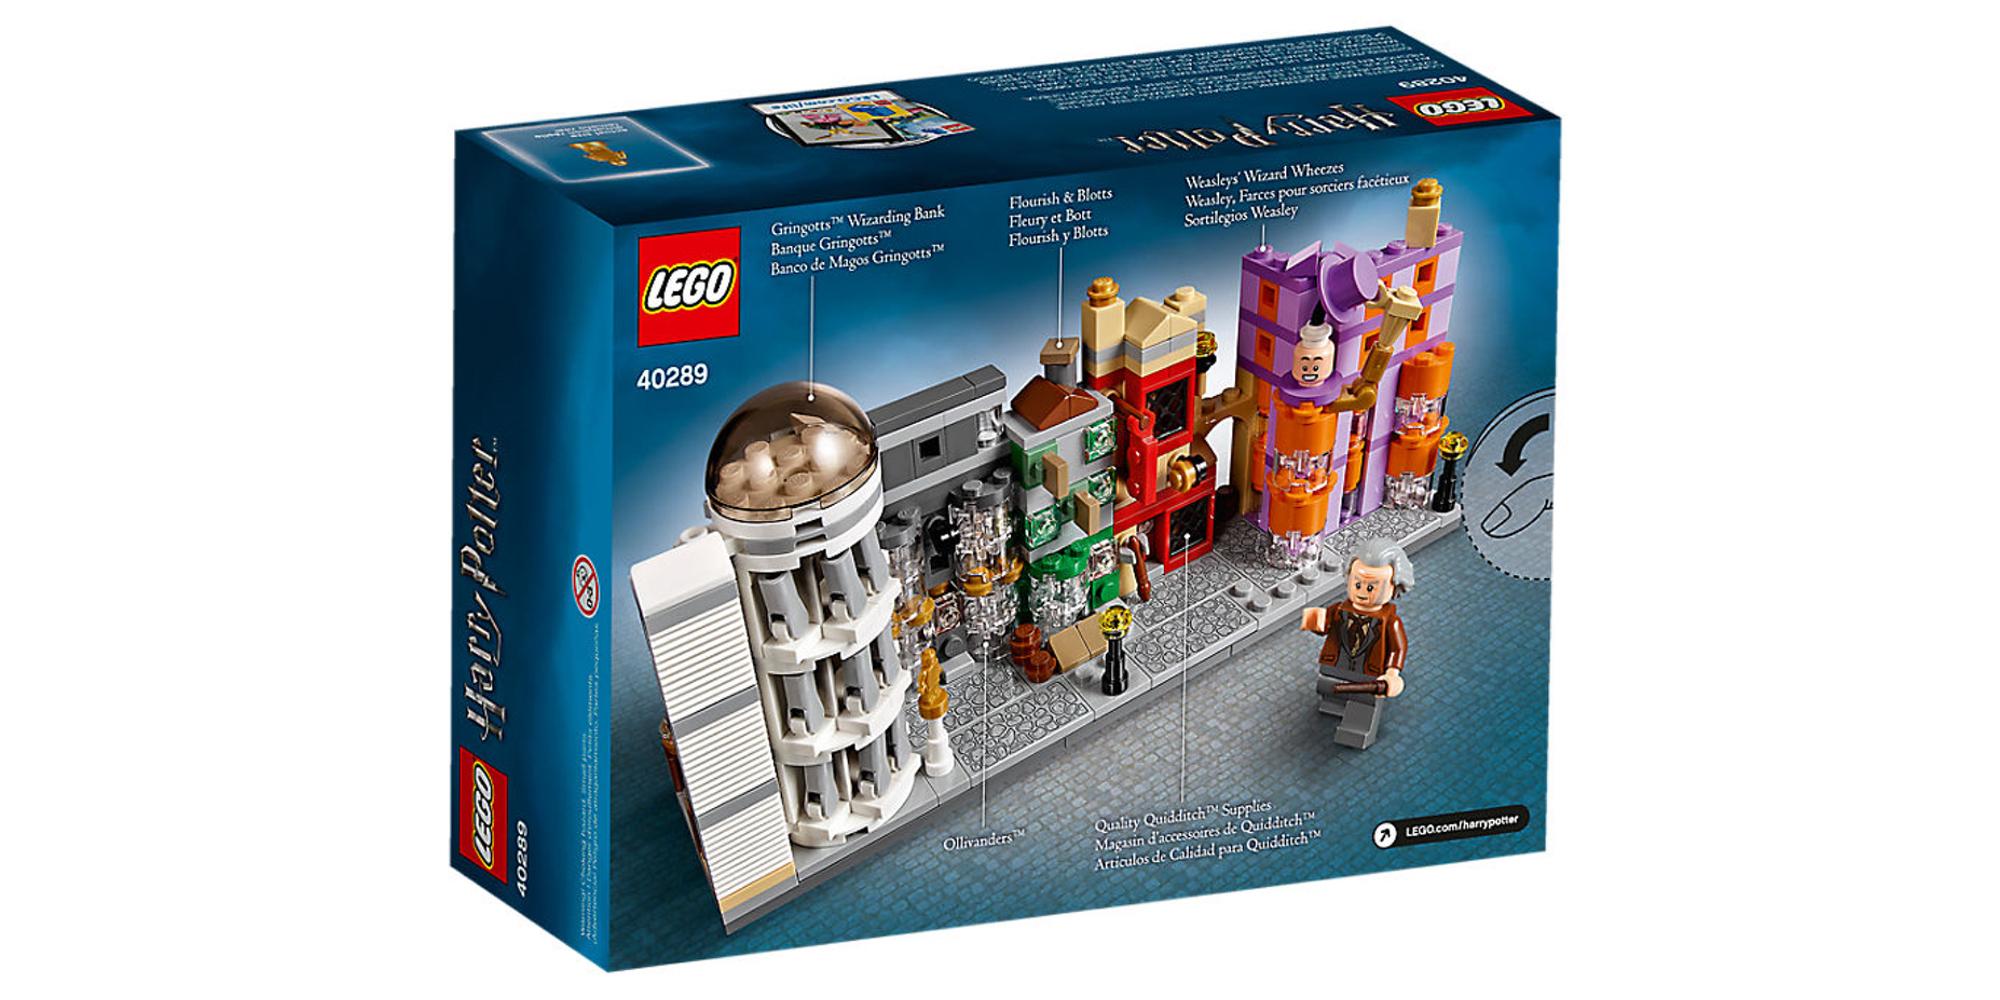 LEGODiagon Alley Box Back